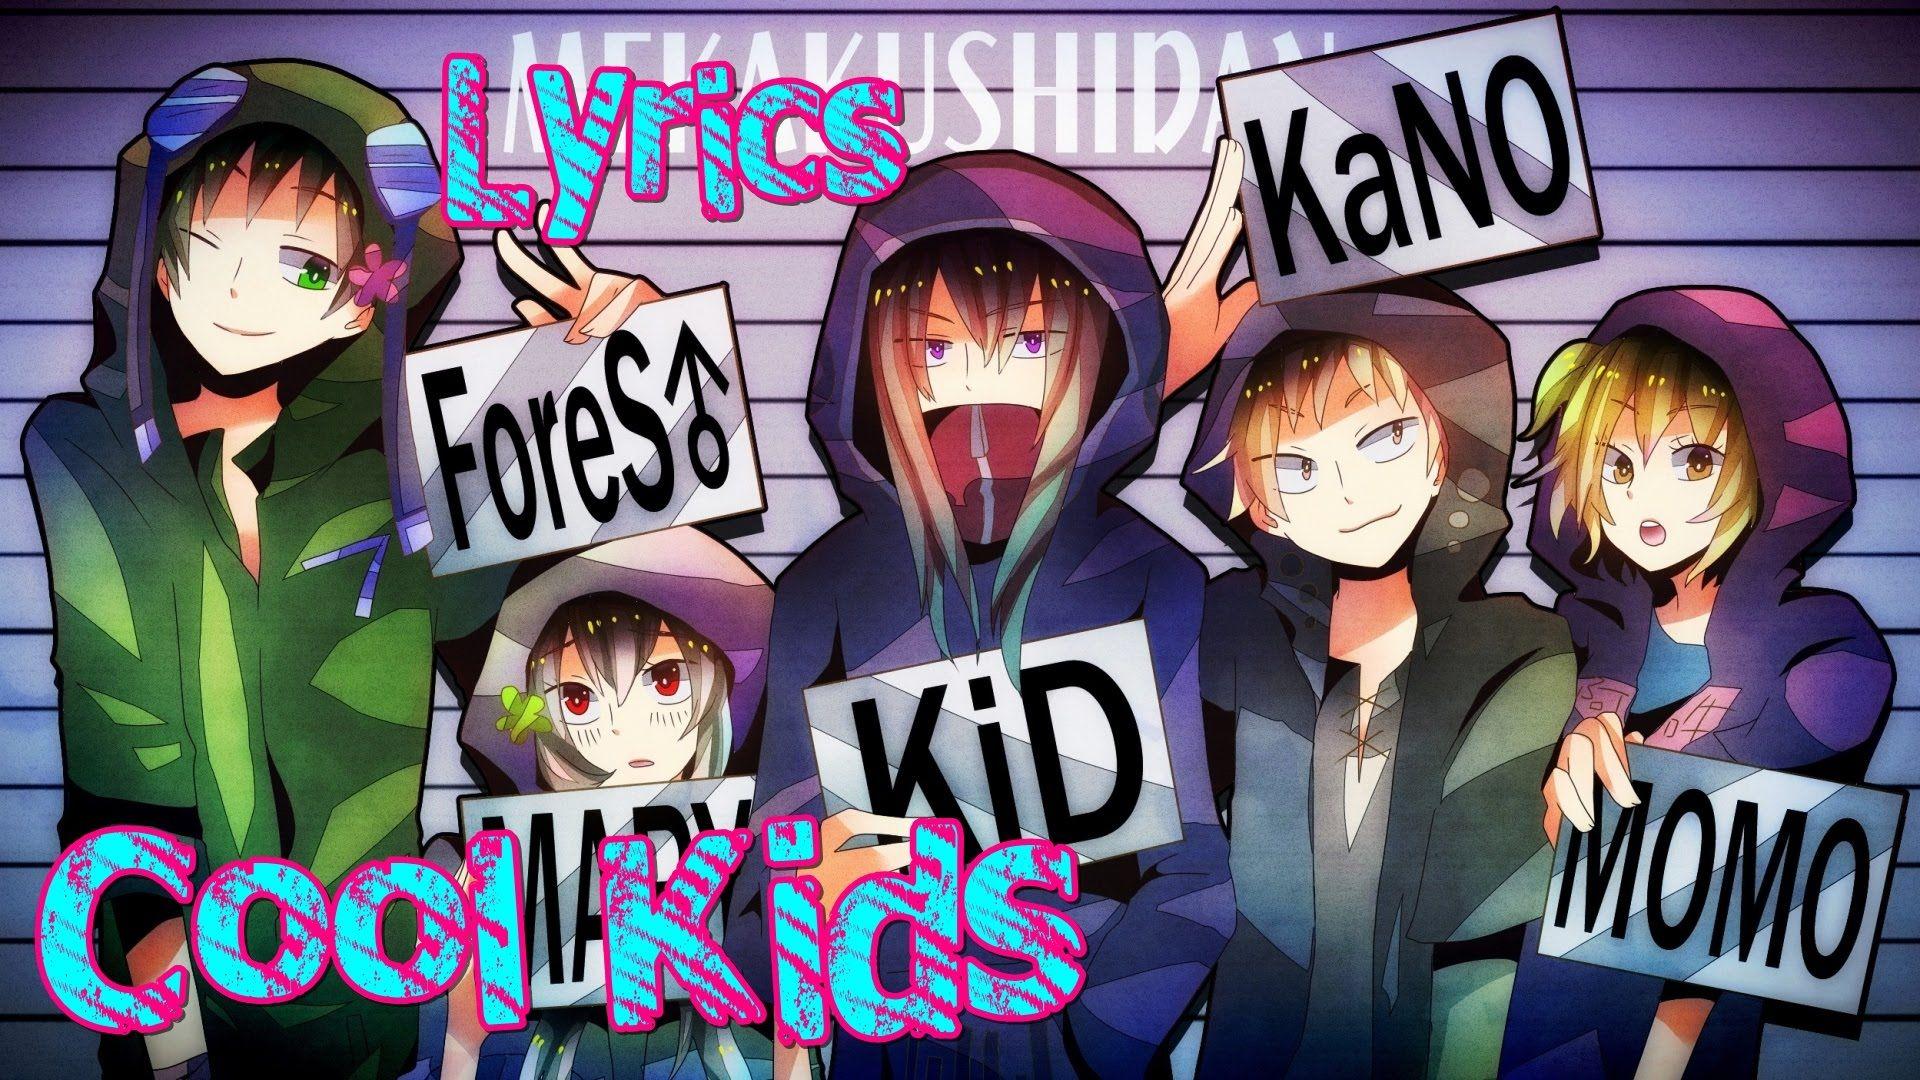 Nightcore Cool Kids Screw the cool kids, join the weirdo